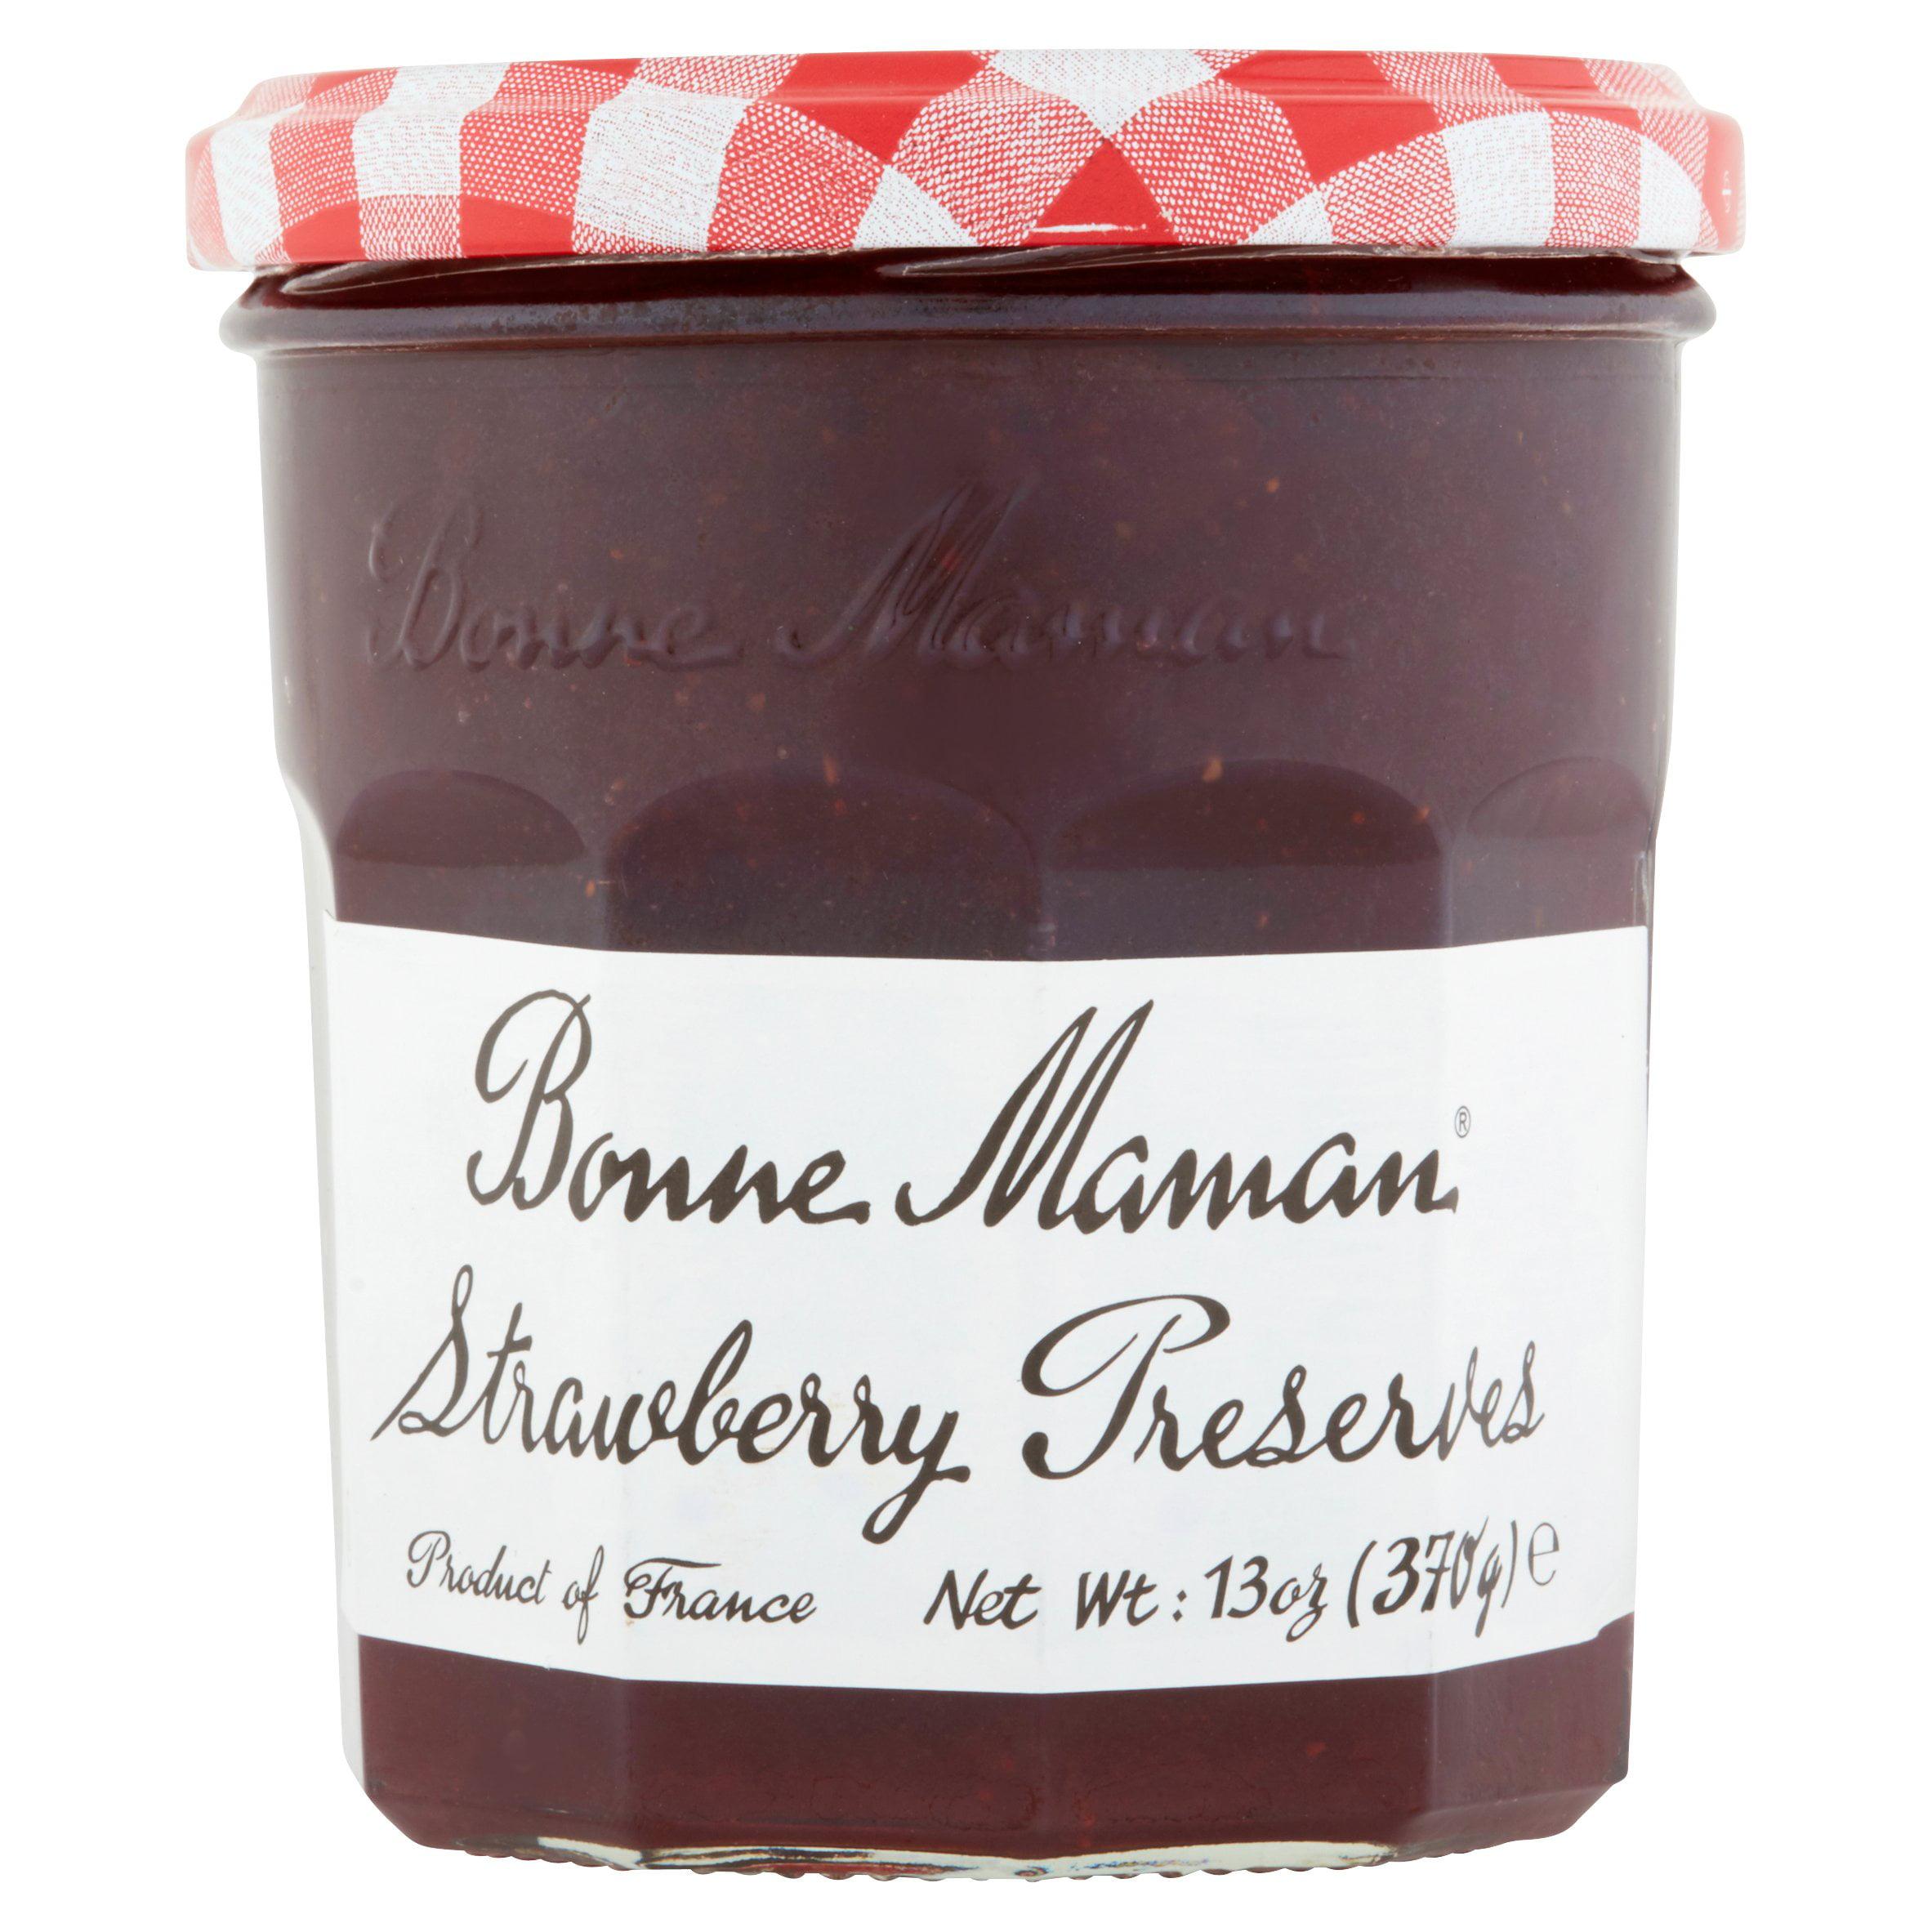 Bonne Maman Strawberry Preserves, 13.0 OZ by Wal-Mart Stores, Inc.